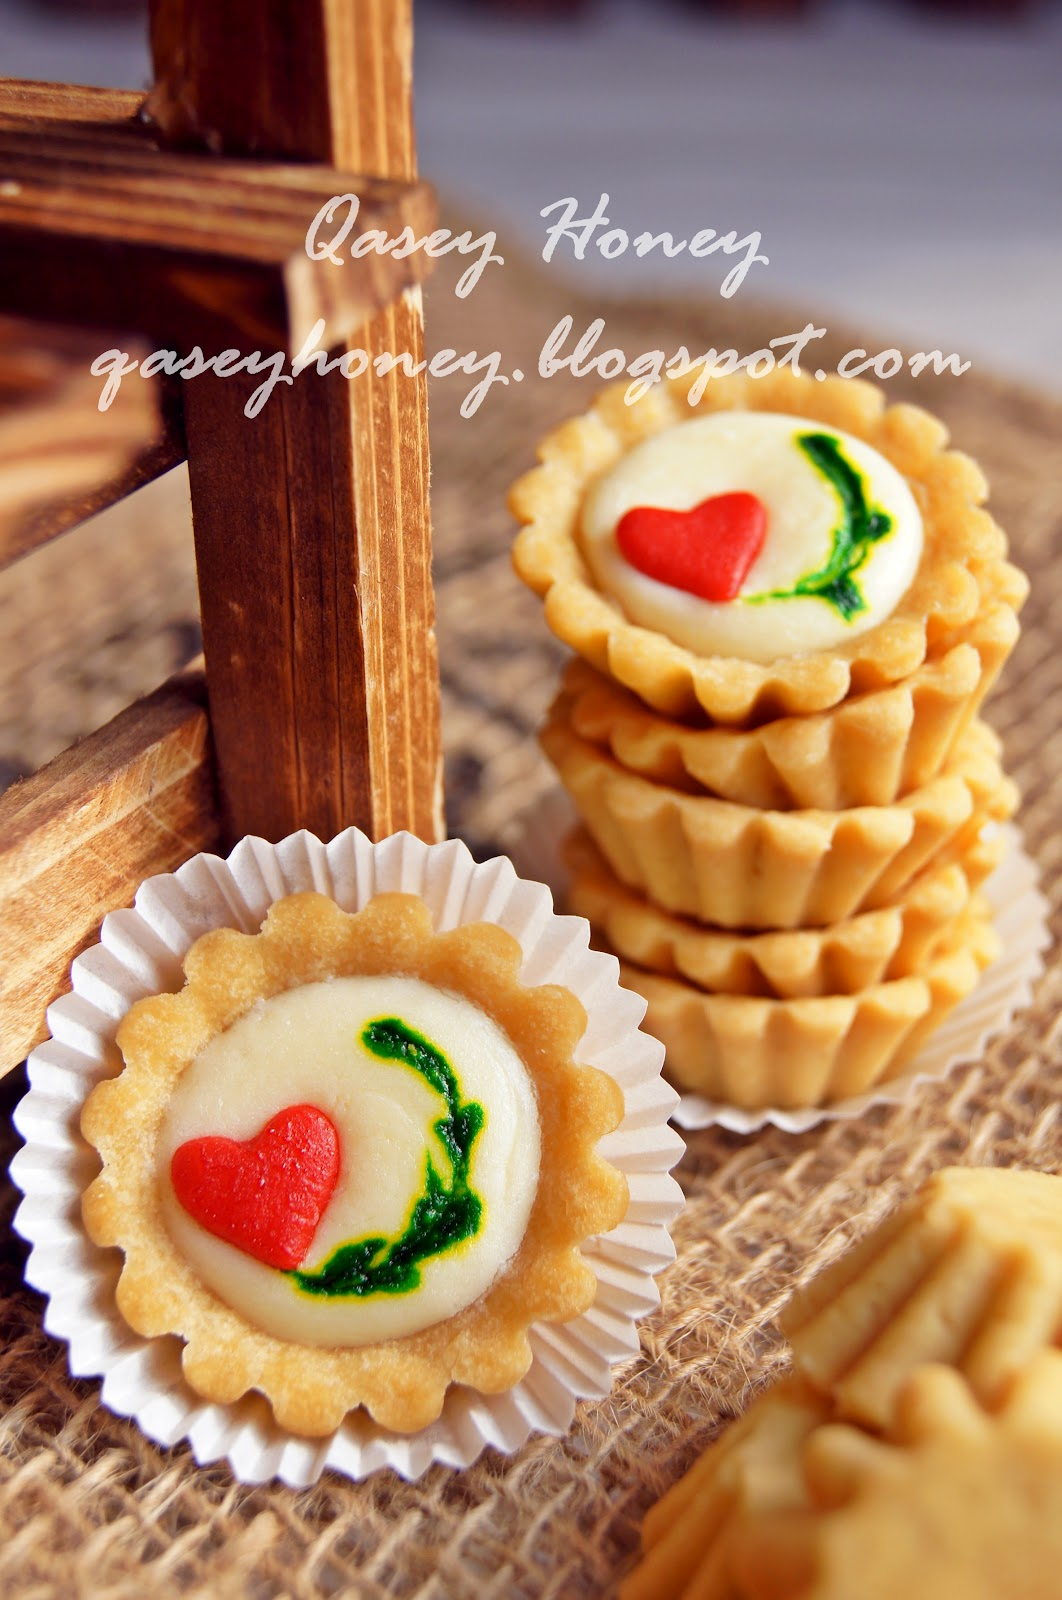 Qasey Honey: KIWI CHEESE TART